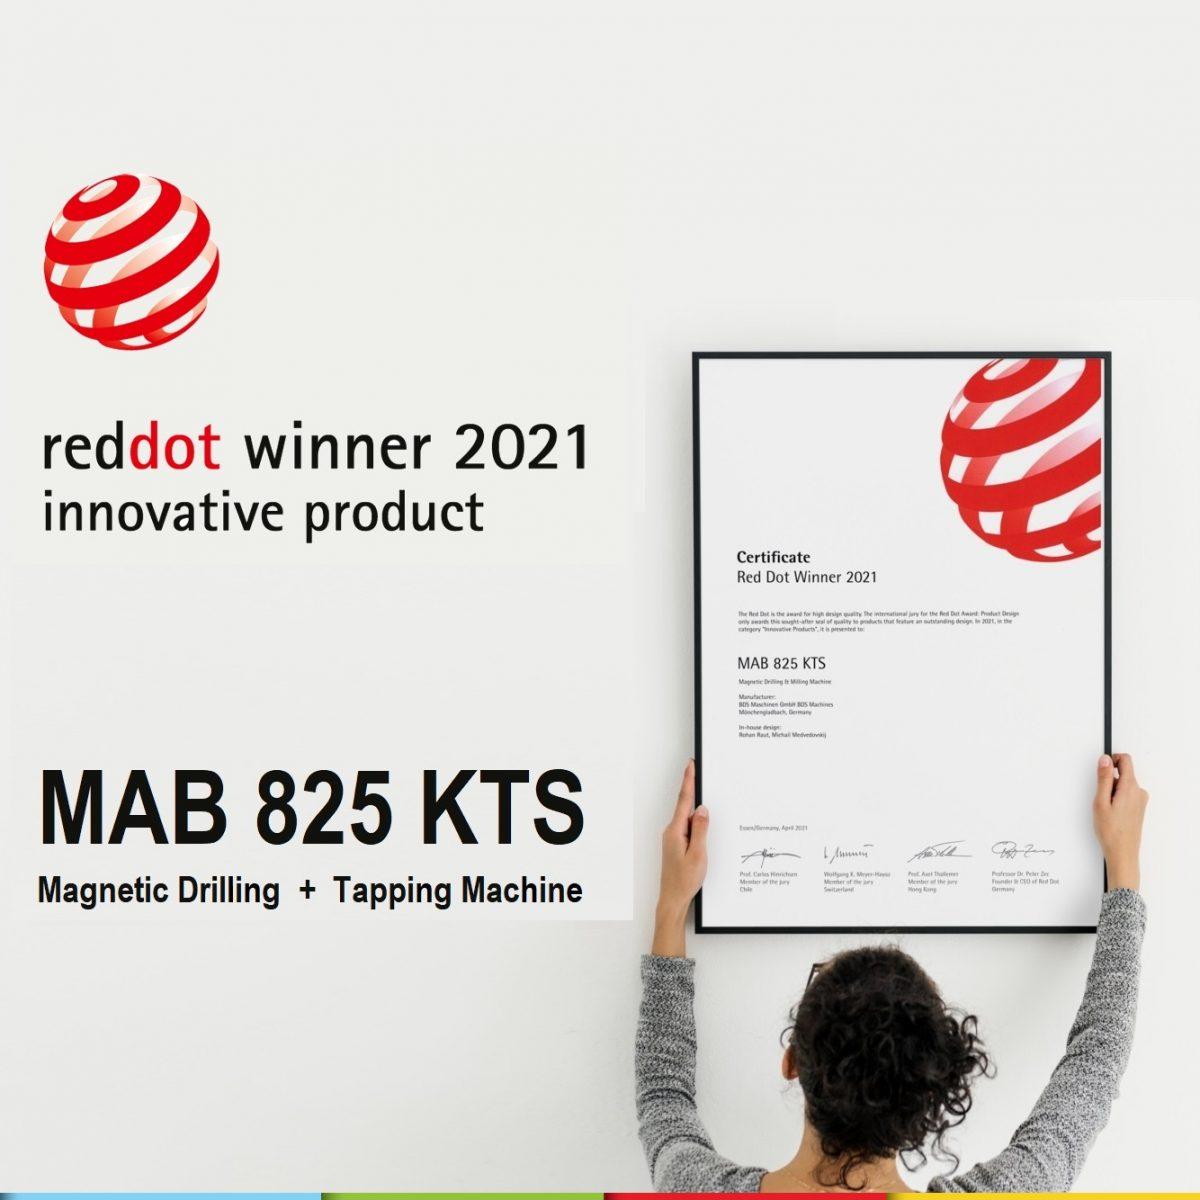 Red Dot Winner innovative product